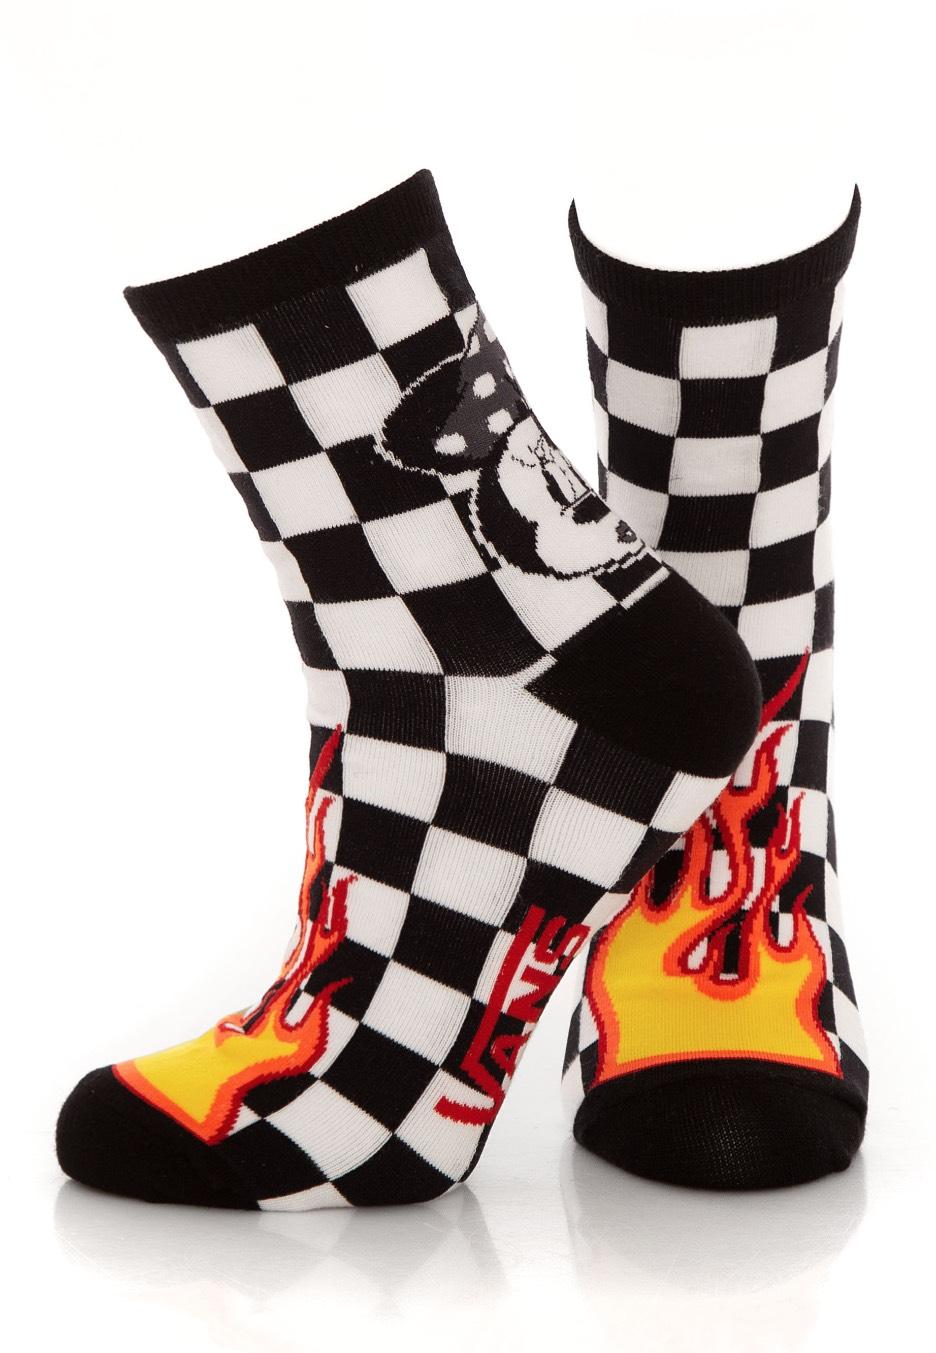 b503d85044ab Vans x Disney - Punk Mickey Crew Black - Socks - Impericon.com Worldwide